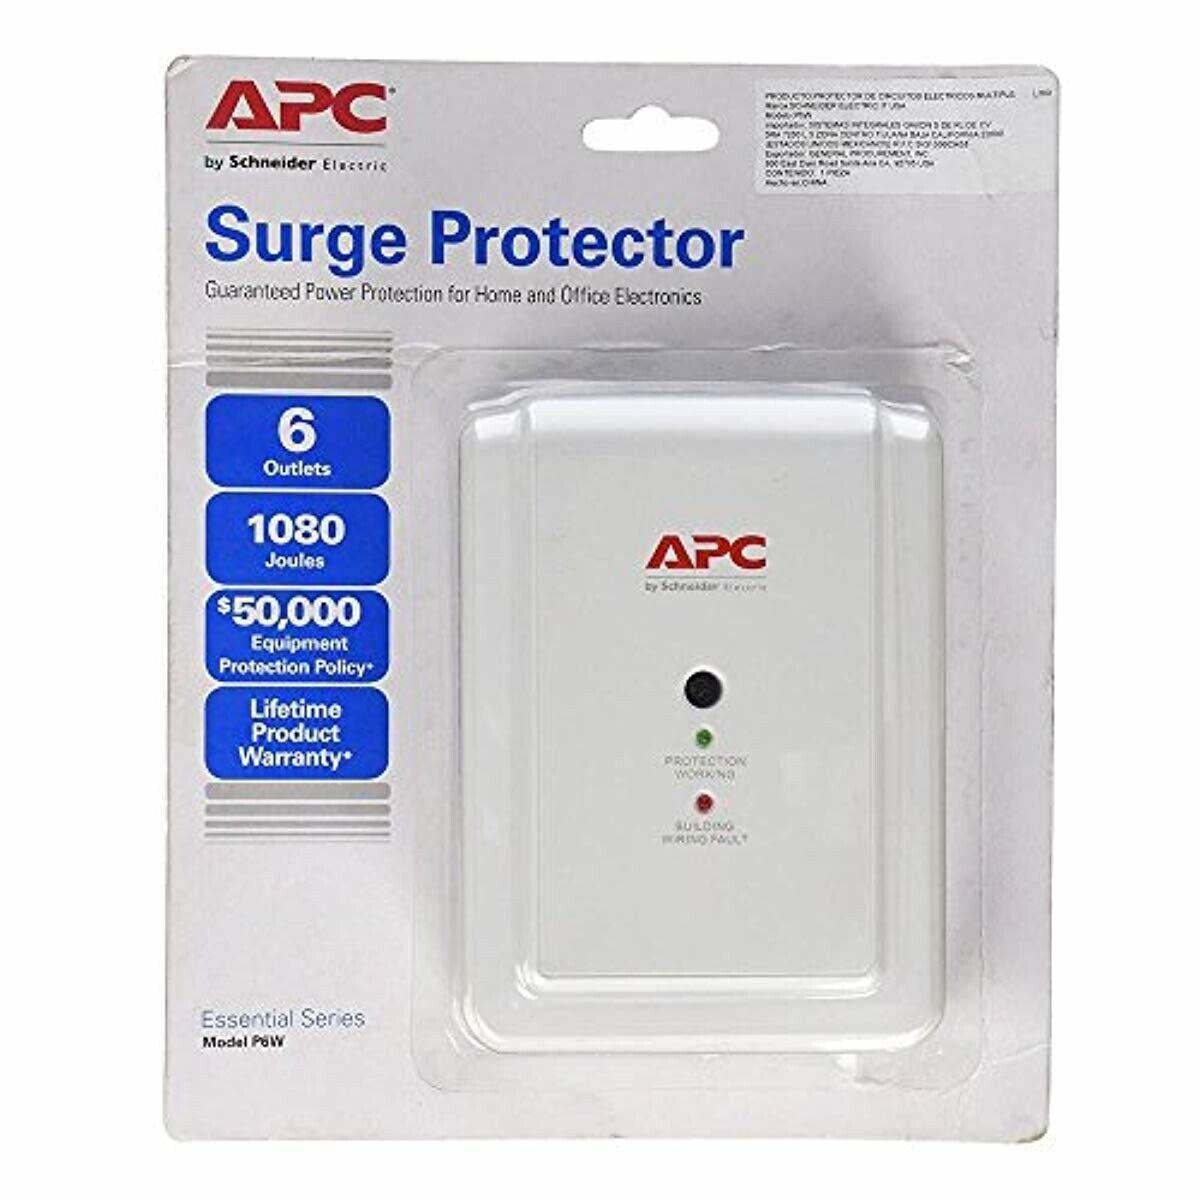 APC 6-Outlet Wall Surge Protector 1080 Joules, SurgeArrest E